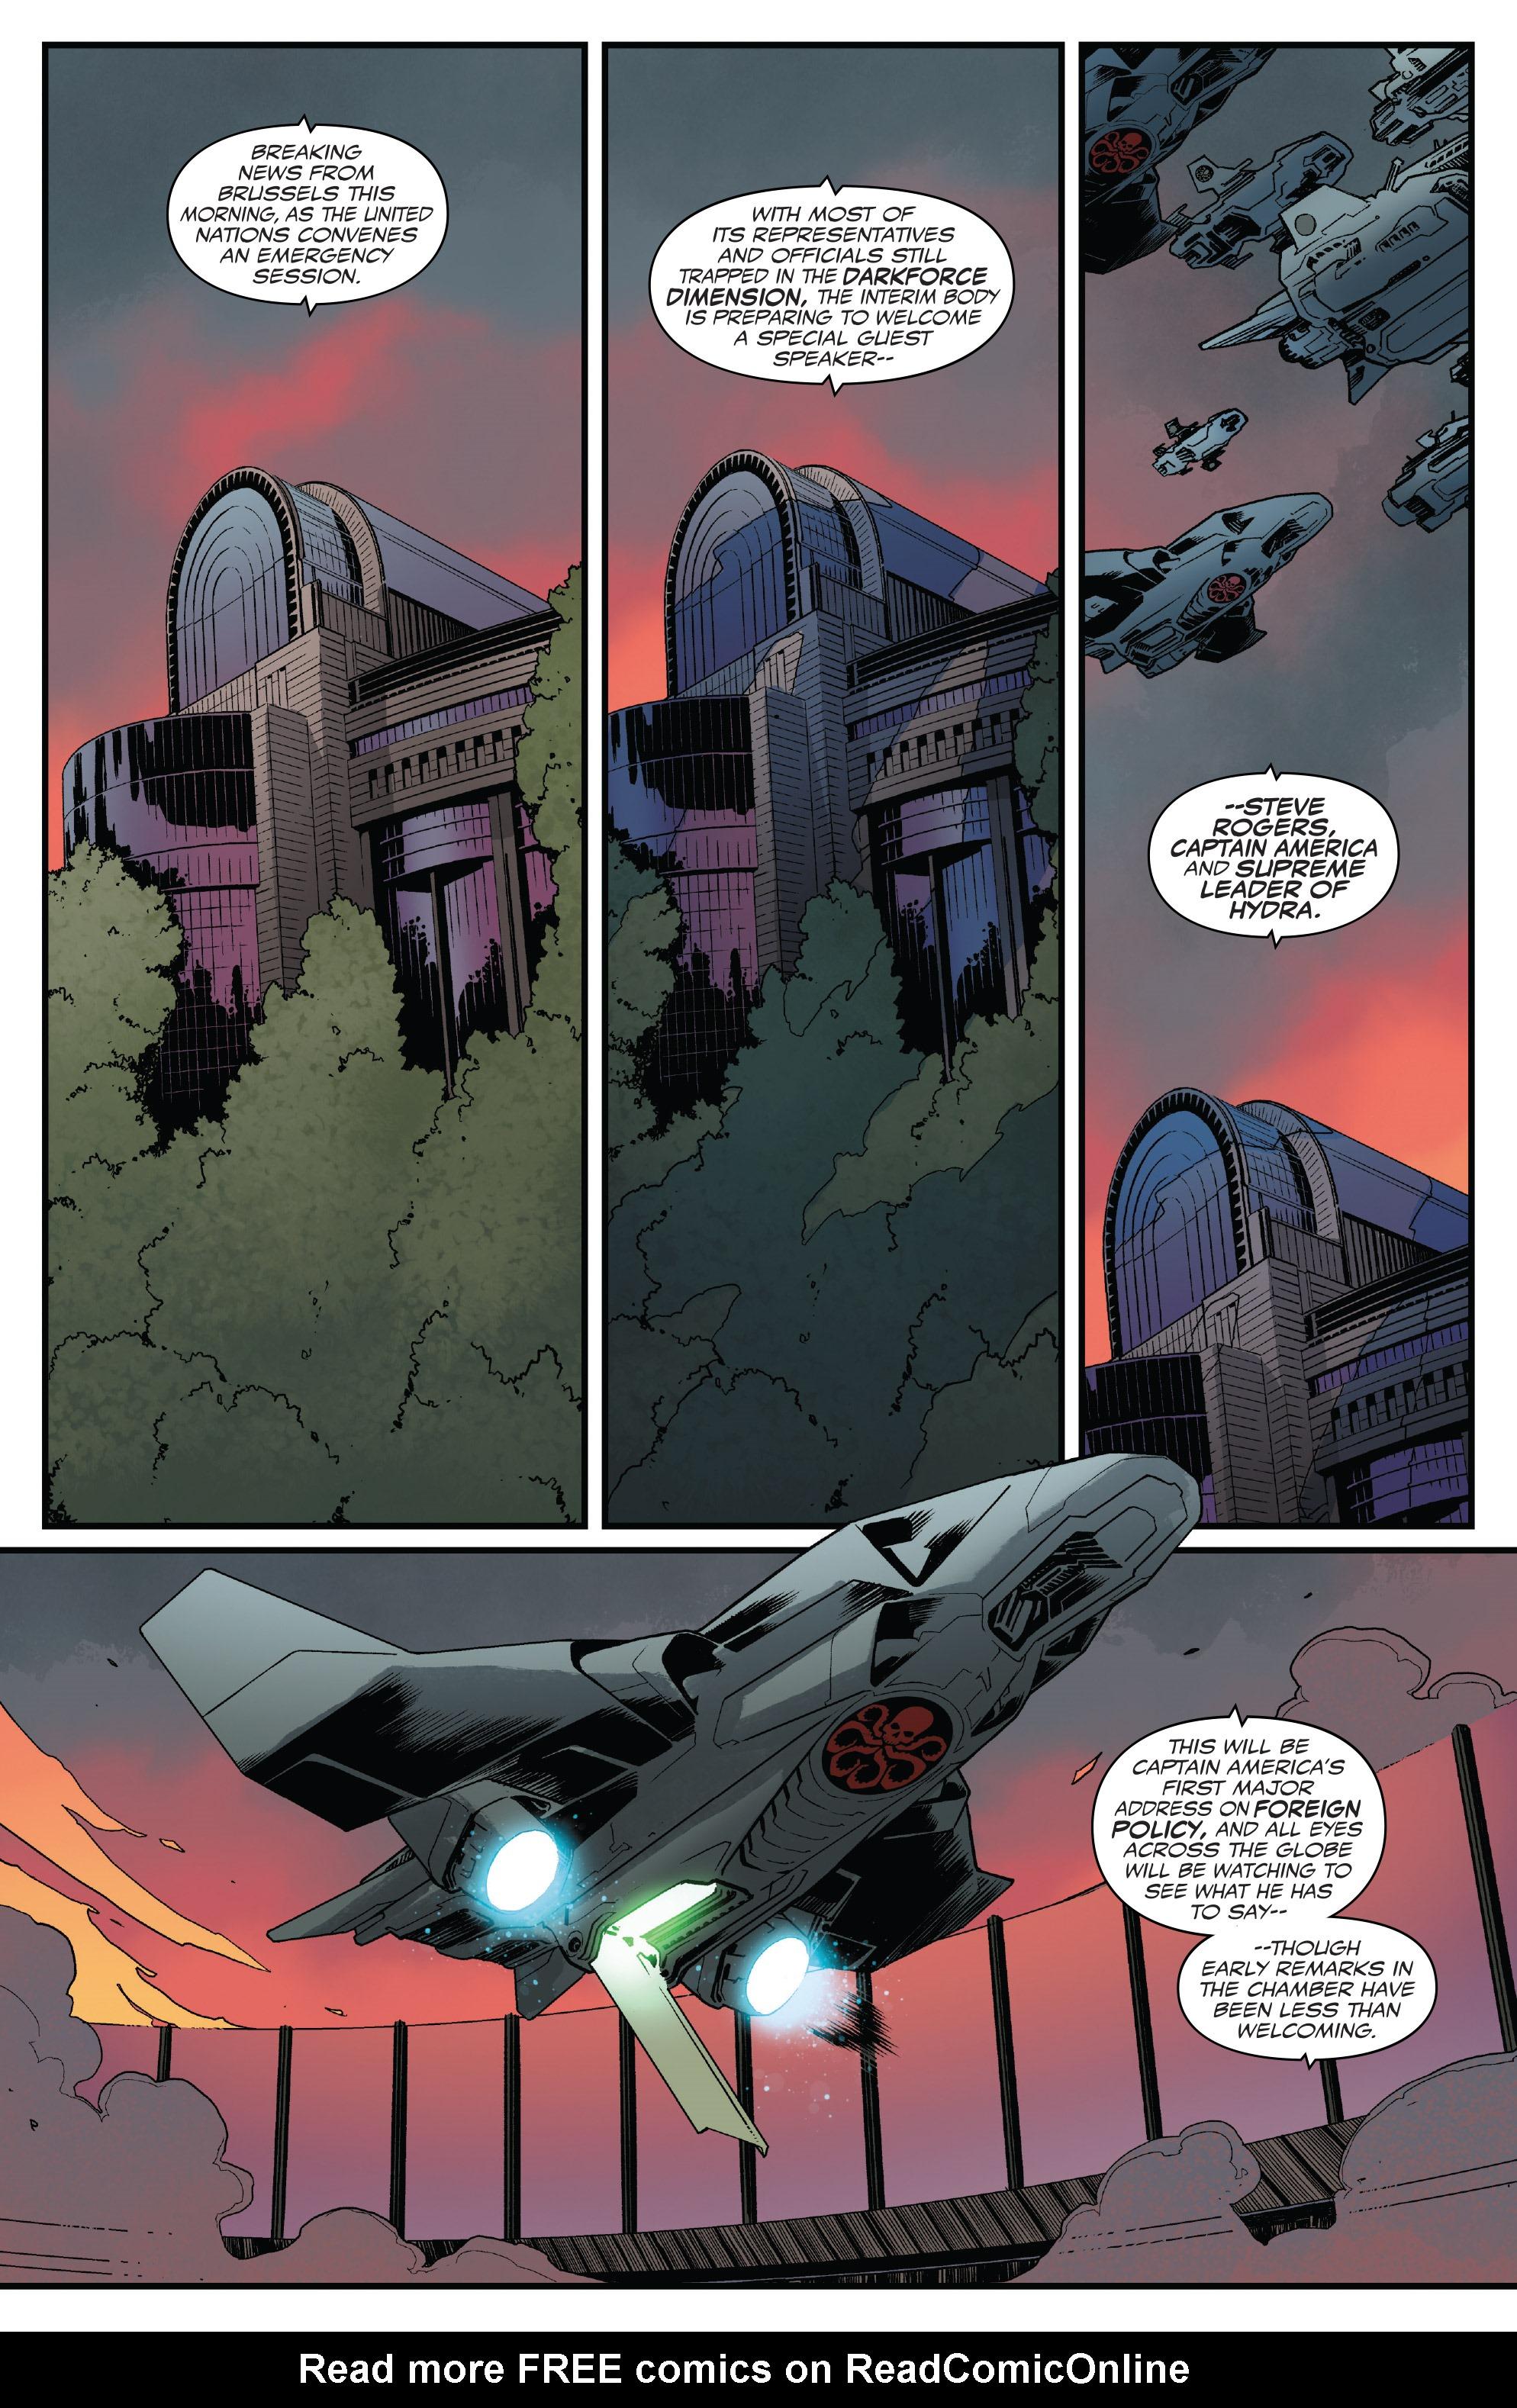 Read online Captain America: Steve Rogers comic -  Issue #18 - 4